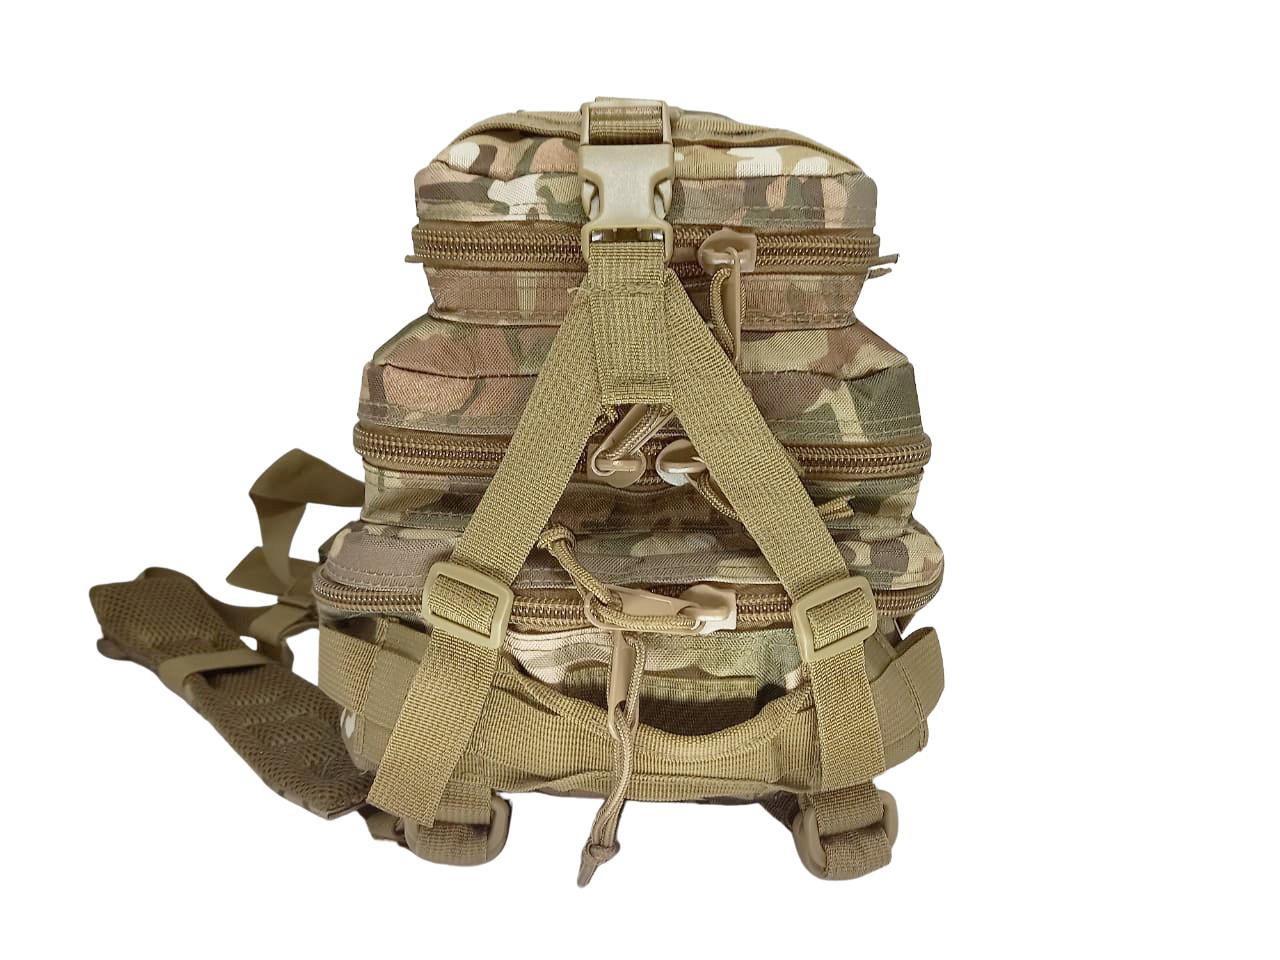 Mochila Tatica Militar Cordura 30 L - Cor: Multicam  - MAB AIRSOFT